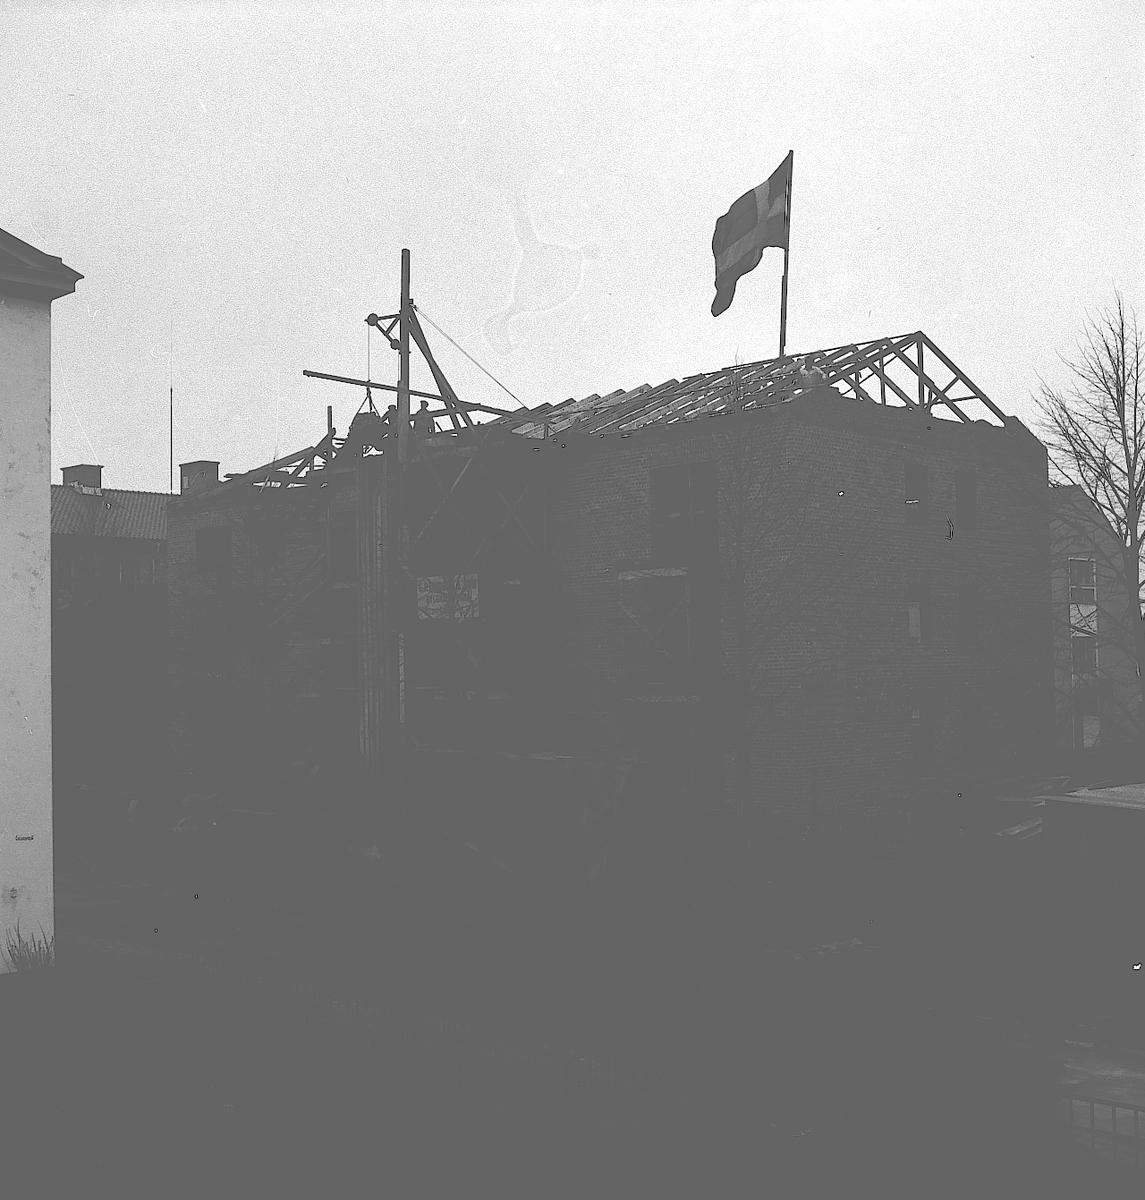 H.S.B. Taklagsfest på Söder. Maj 1944